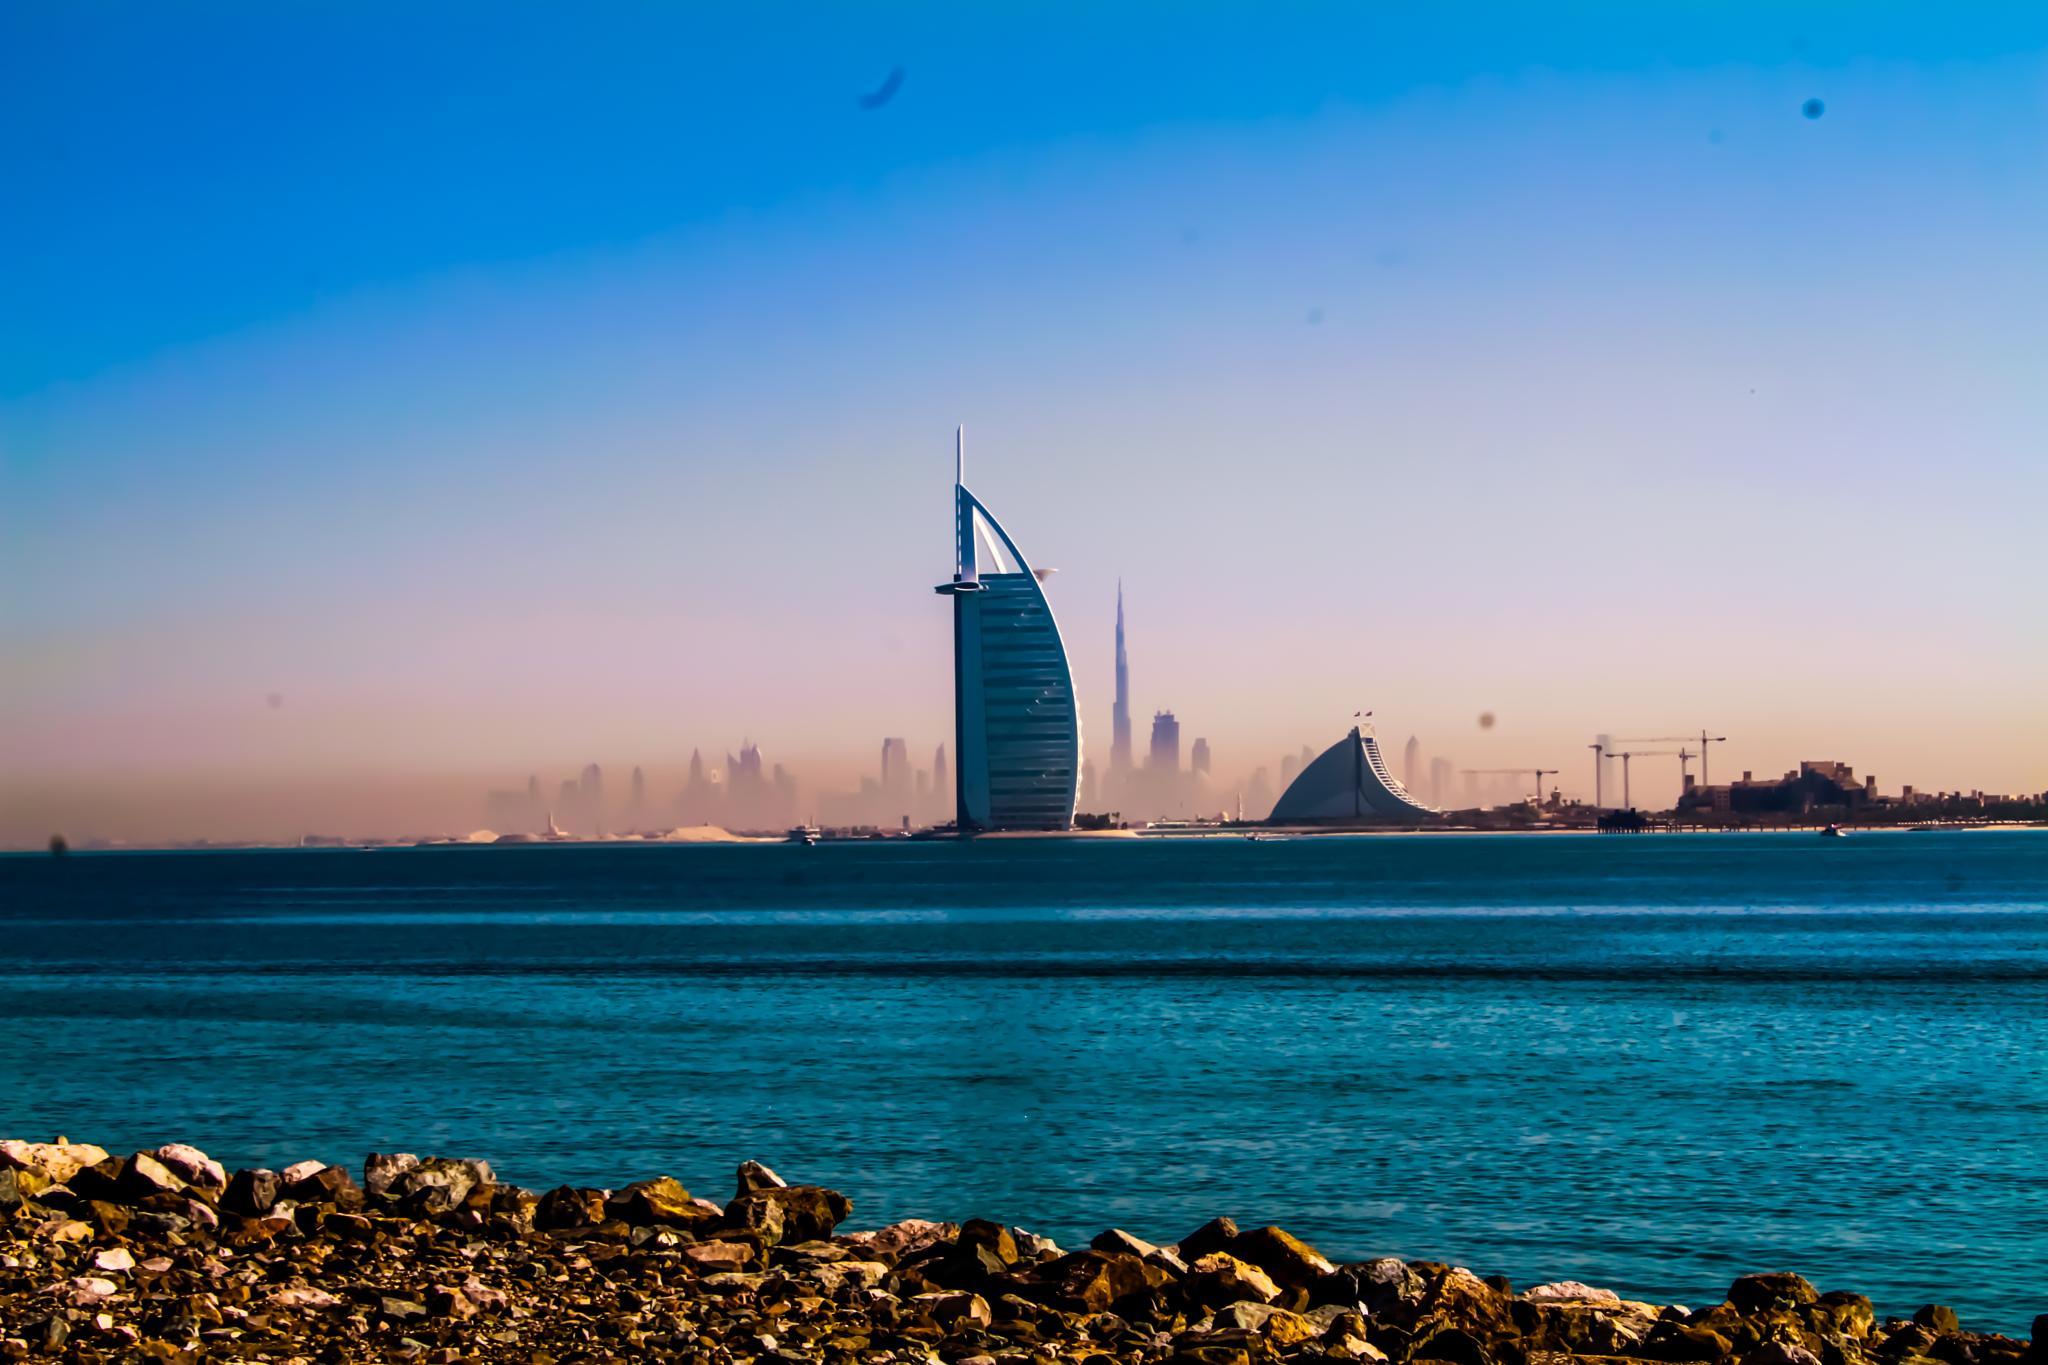 Burj Ul Arab by danish.khanxada